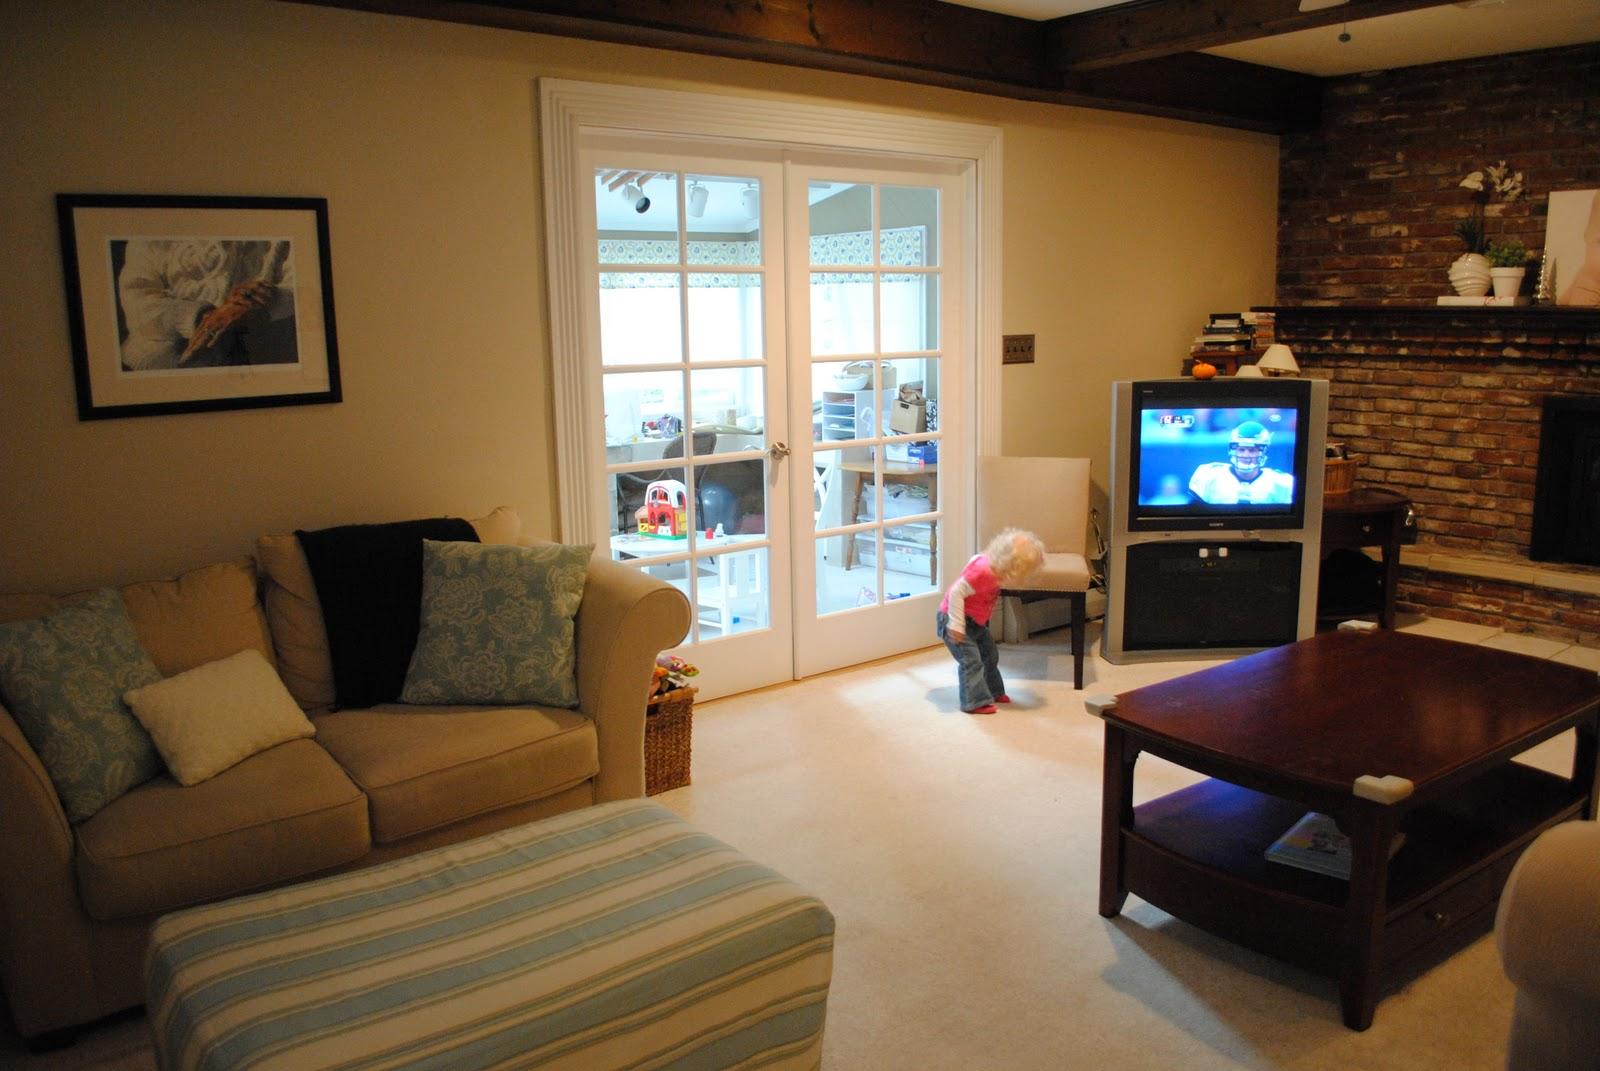 Light Living Room Living Room Renovation Part One The Problem Making Lemonade